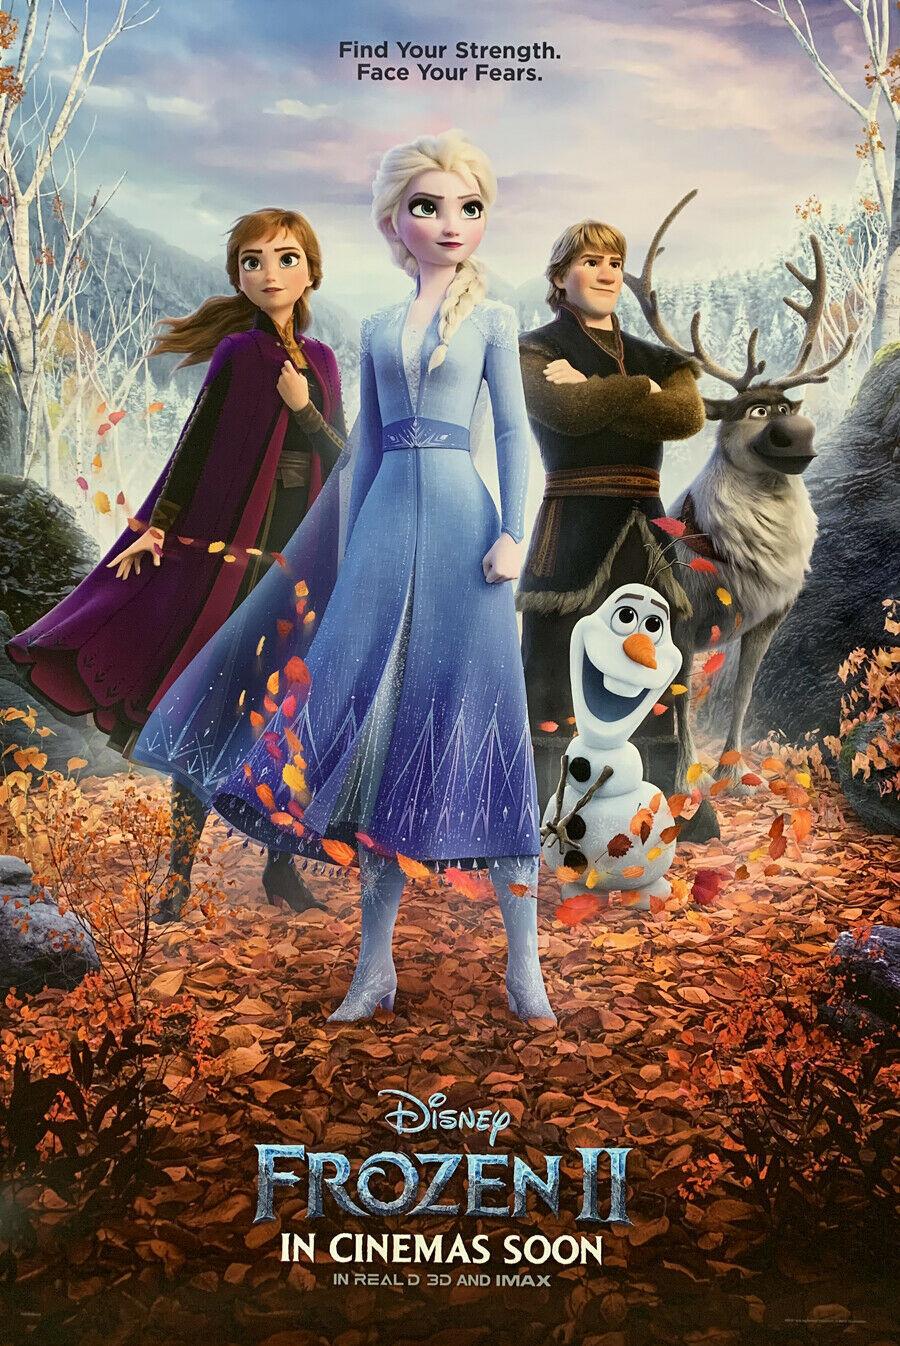 La Reine des Neiges II [Walt Disney - 2019] - Page 21 Frozen-2-New-Poster-frozen-43025908-900-1346